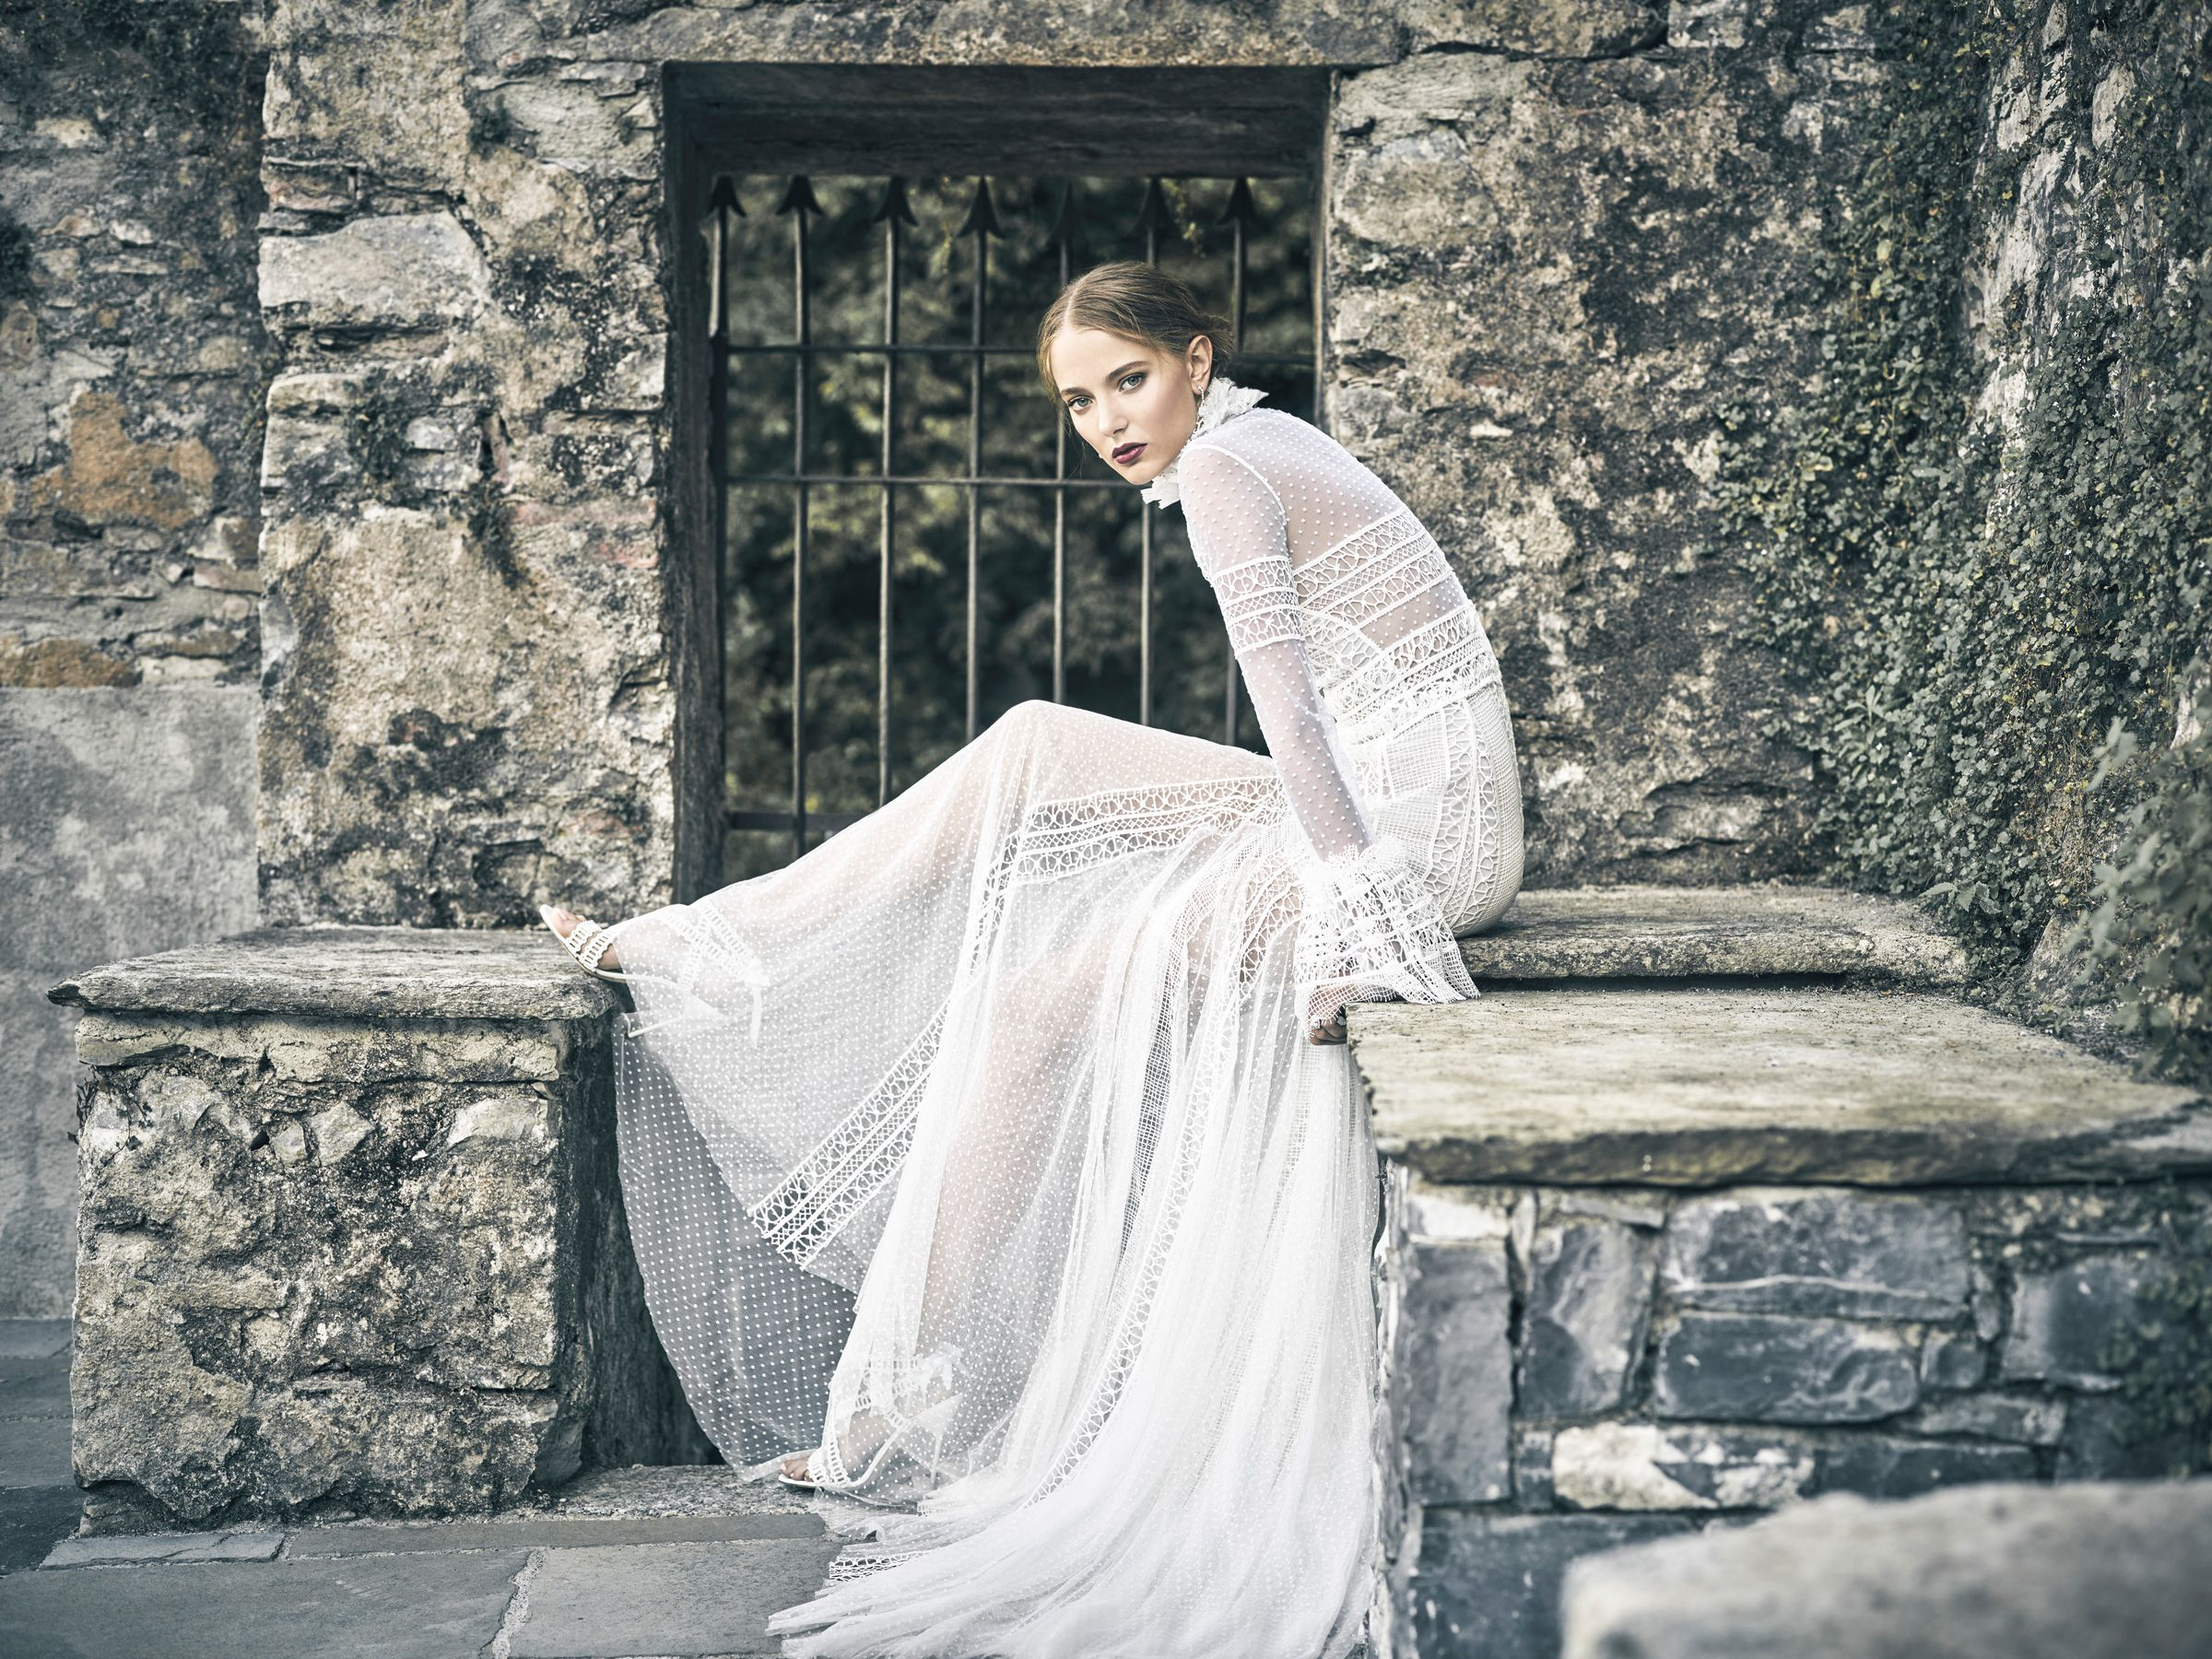 8574363d96f1a 70 Best Bohemian Wedding Dresses - Boho Wedding Dress Ideas for Hippie  Brides